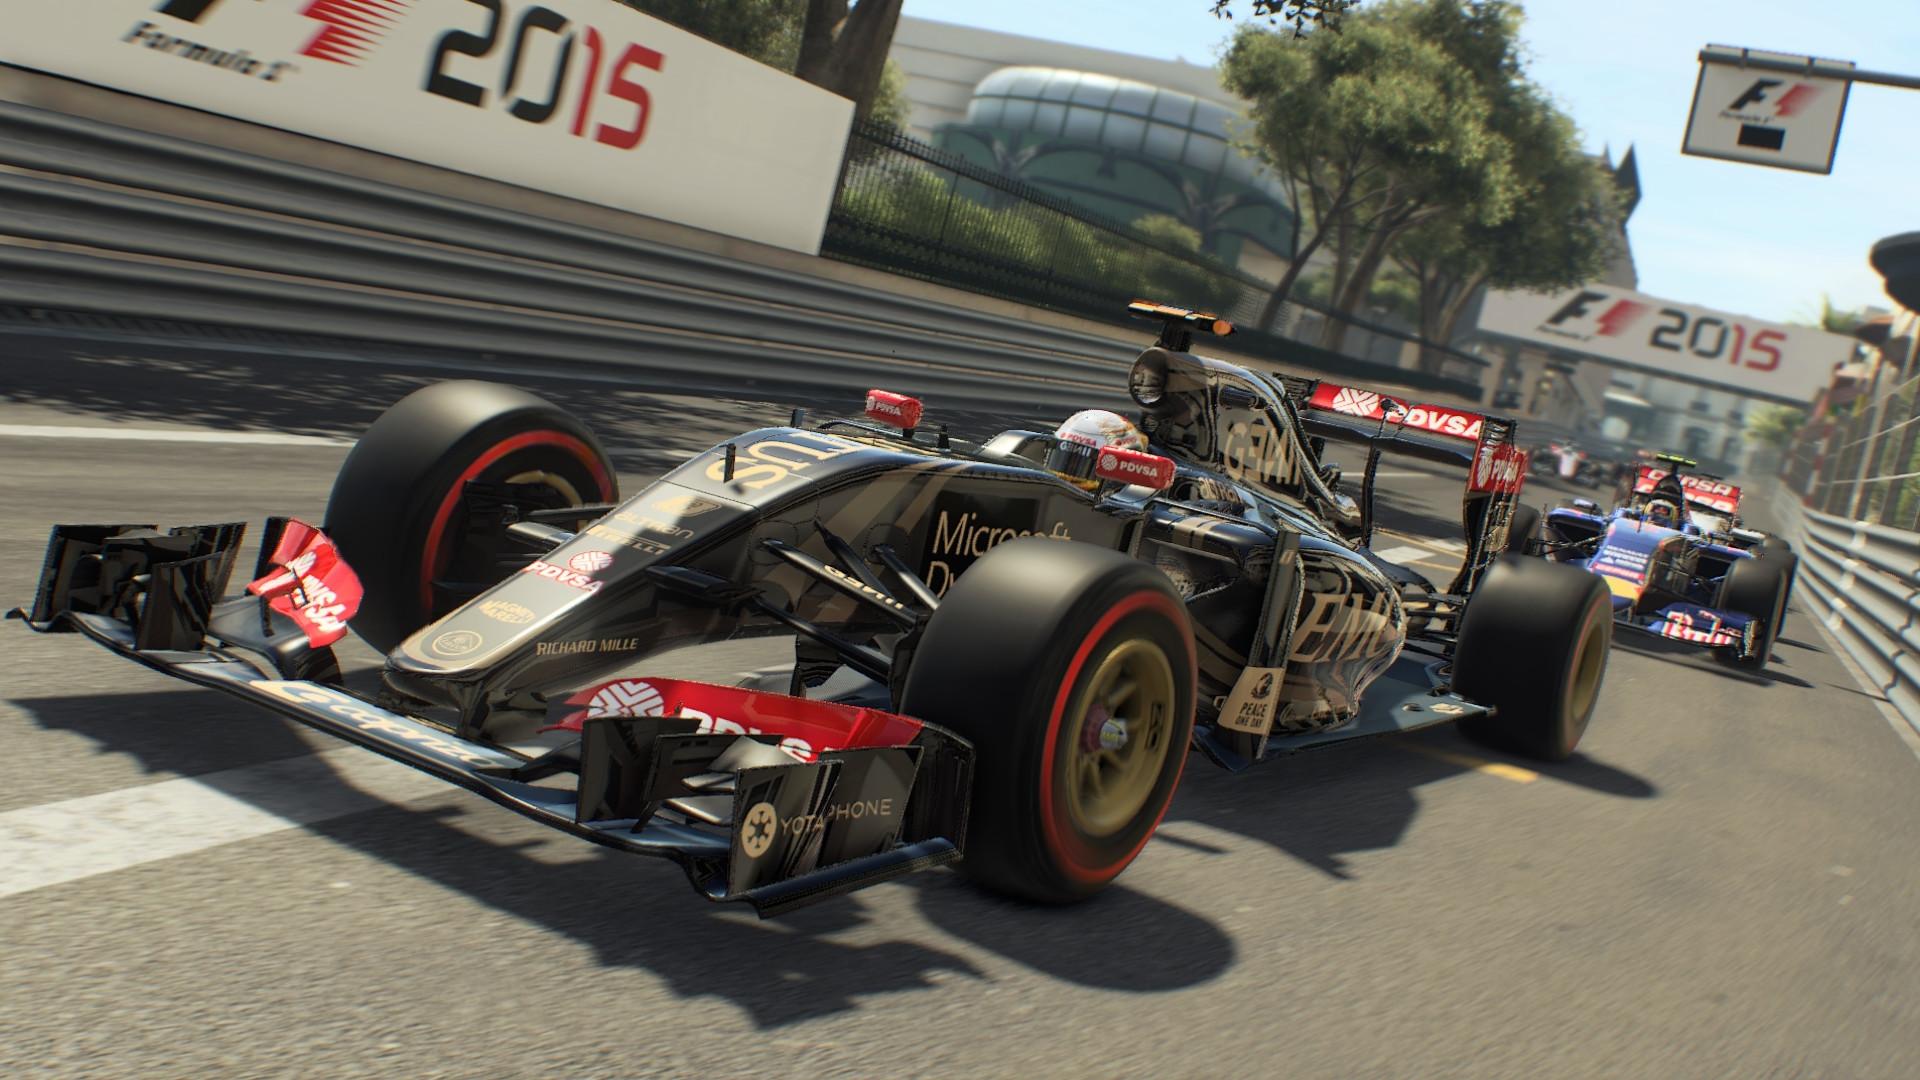 F1 2015 ESPAÑOL PC Full (CPY) + UPDATE v1.0.19.5154 + REPACK 2 DVD5 (JPW) 1